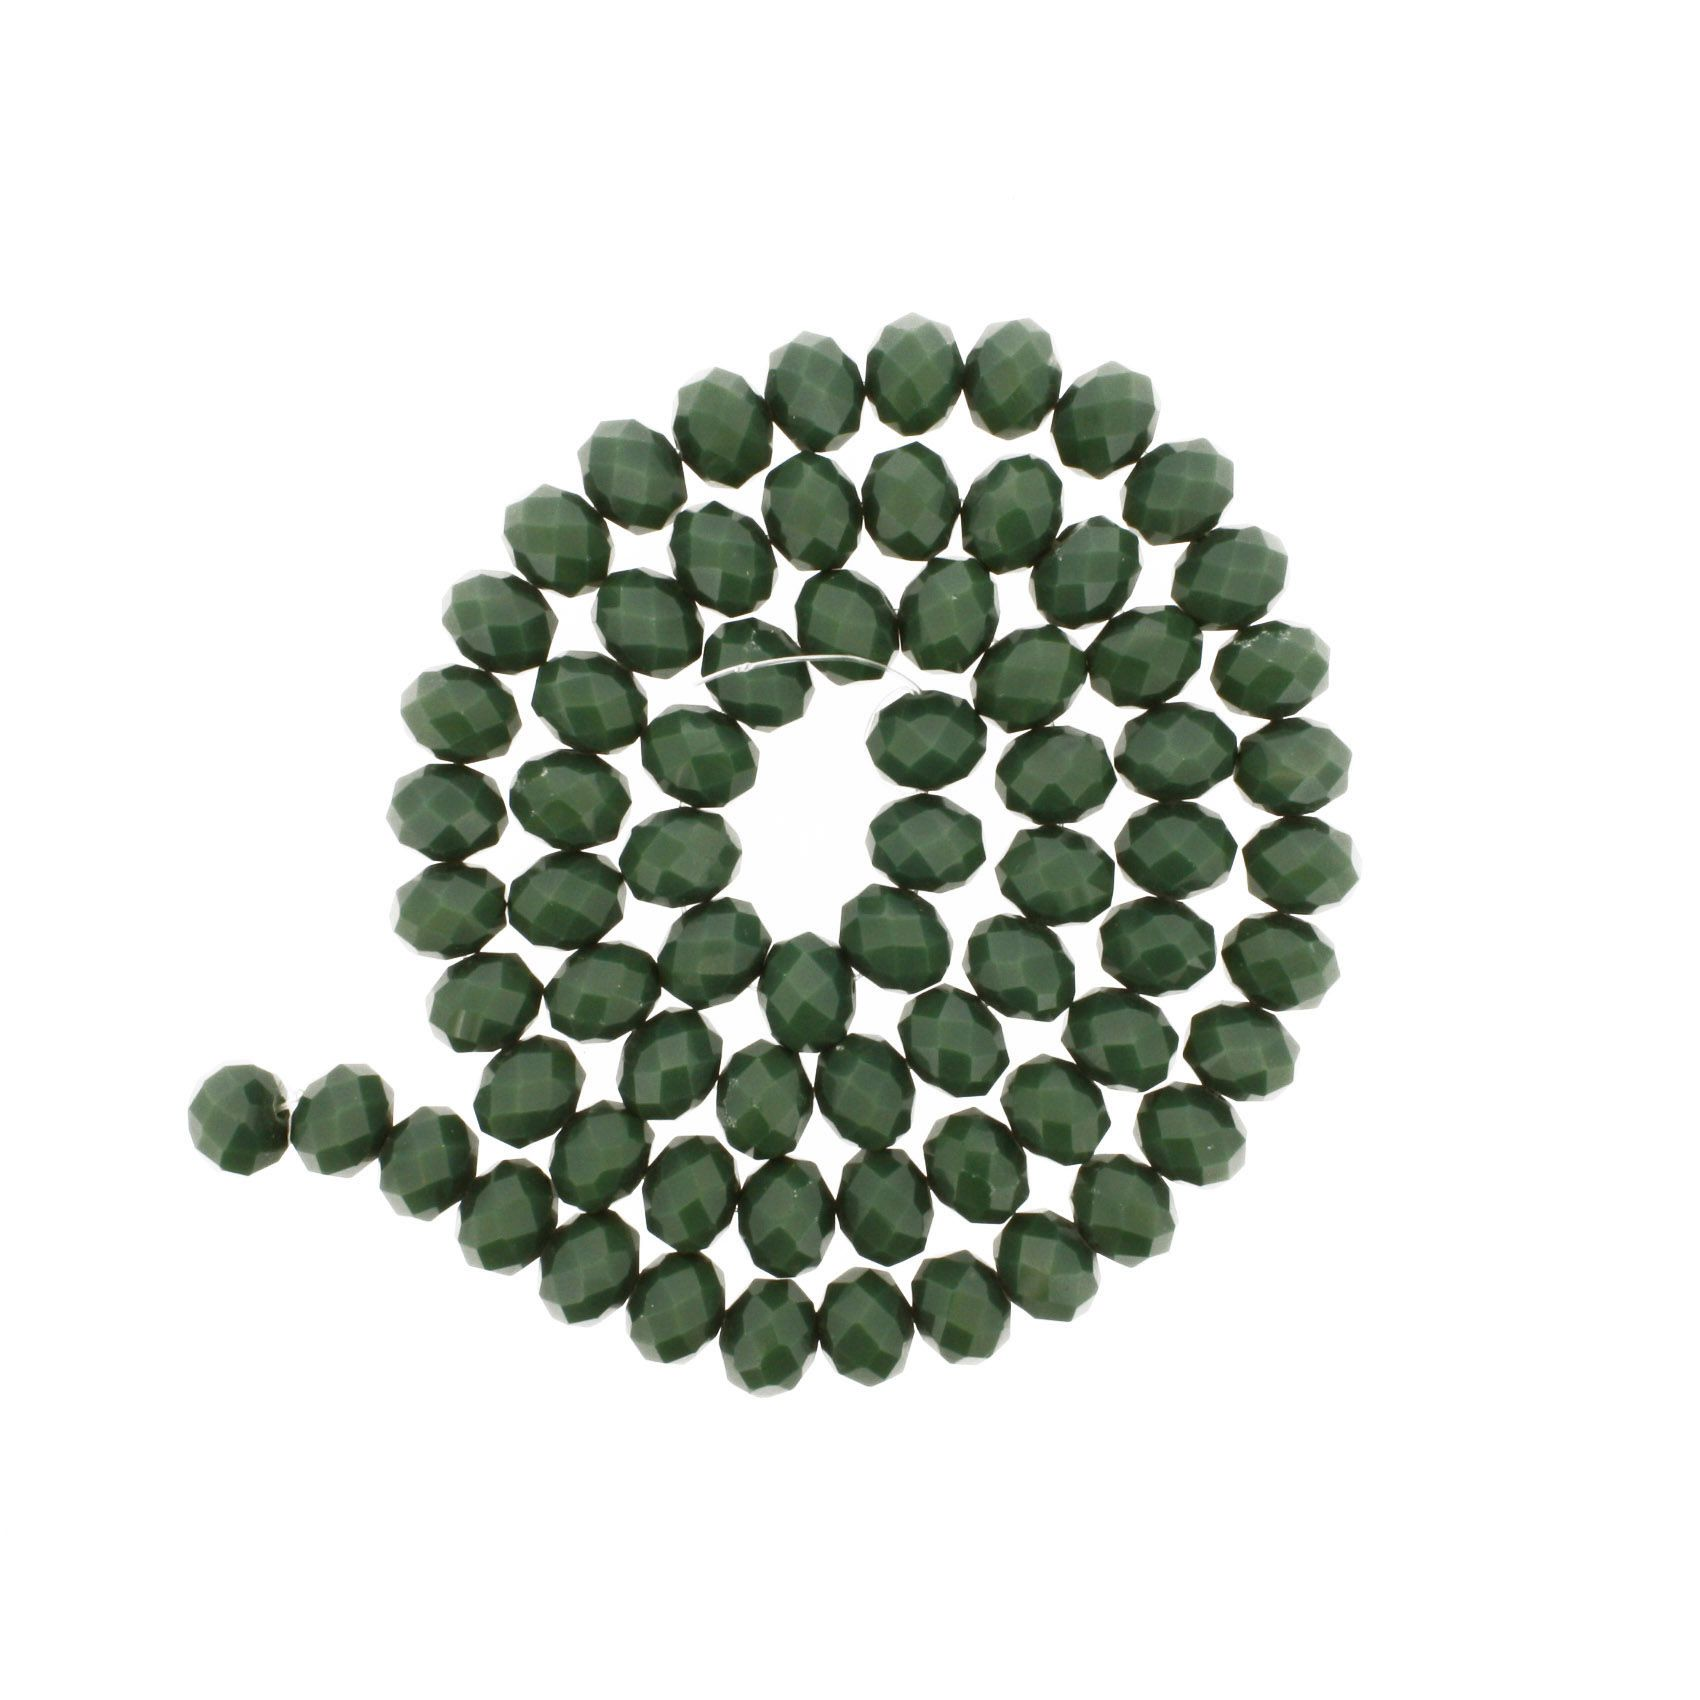 Fio de Cristal - Flat® - Verde - 10mm  - Stéphanie Bijoux® - Peças para Bijuterias e Artesanato